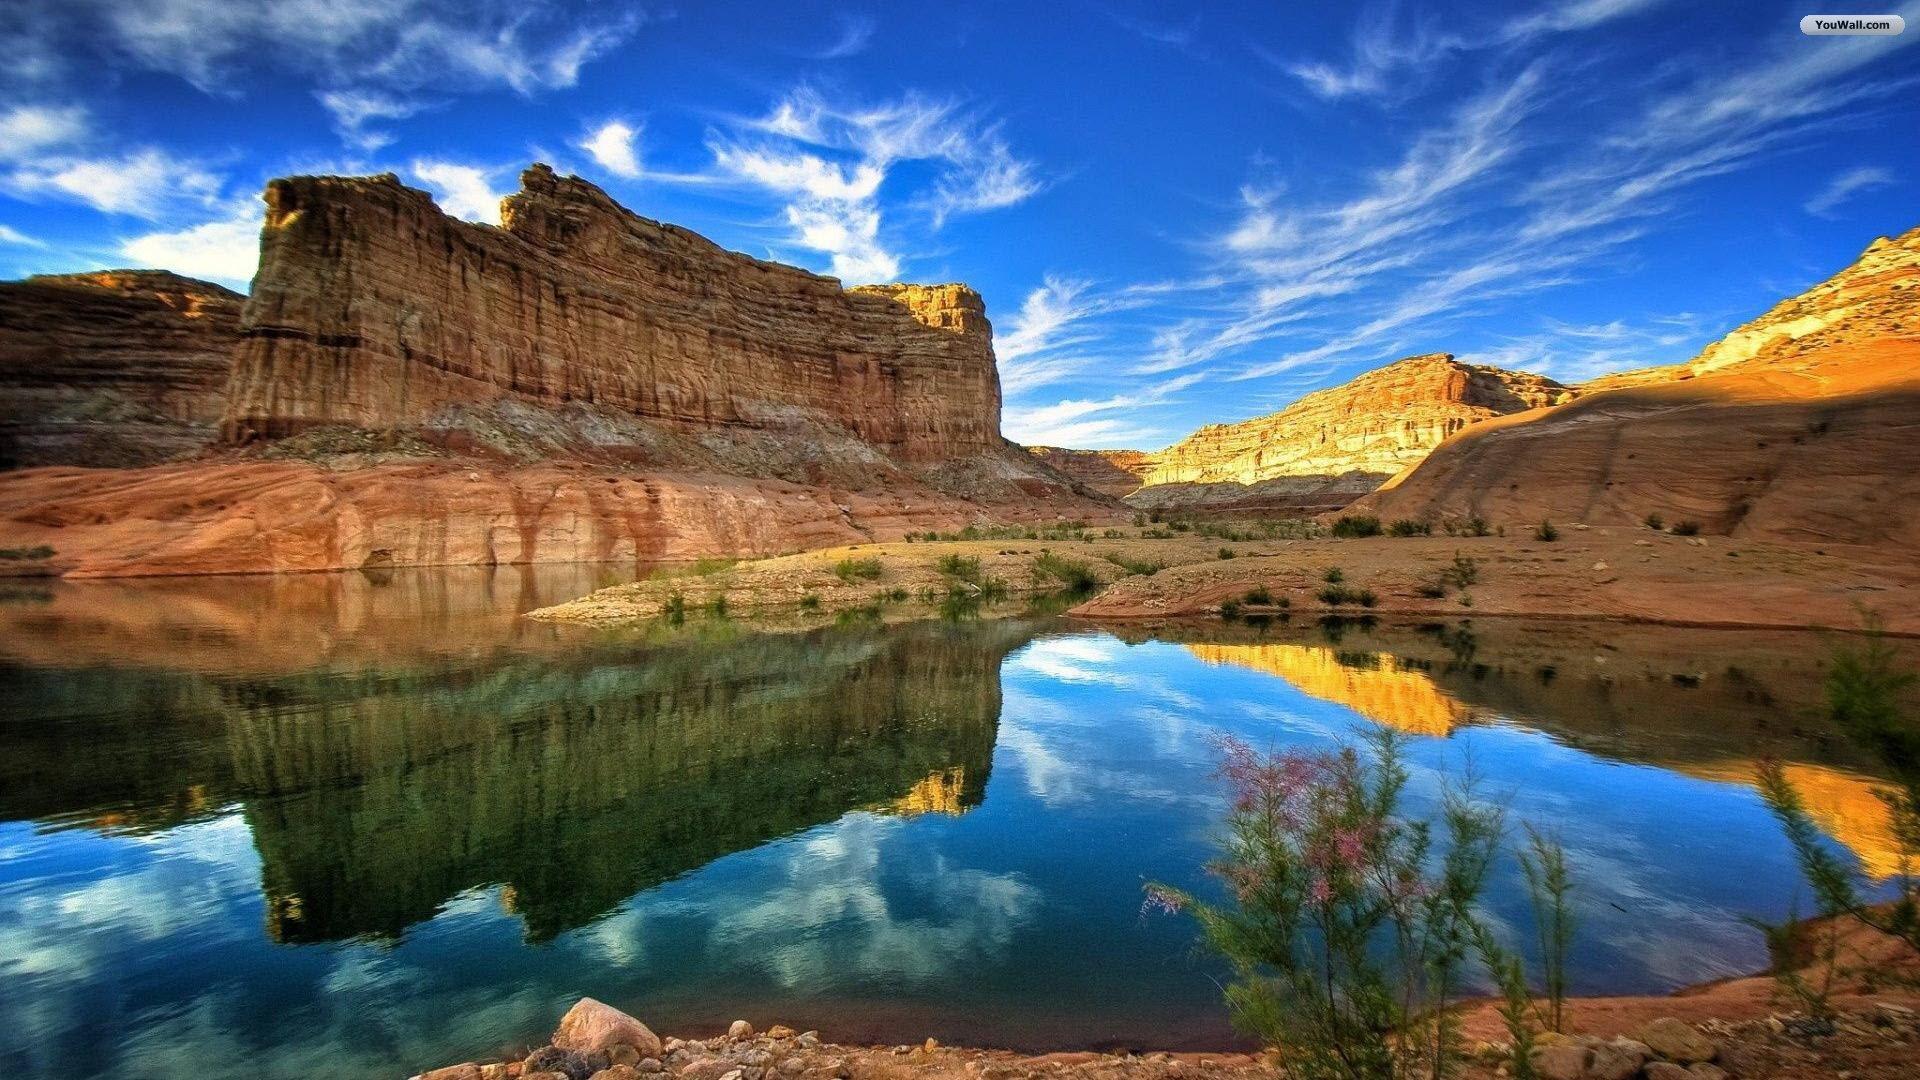 Popular Wallpaper Mac Grand Canyon - 1754_the_grand_canyon  You Should Have_813343.jpg